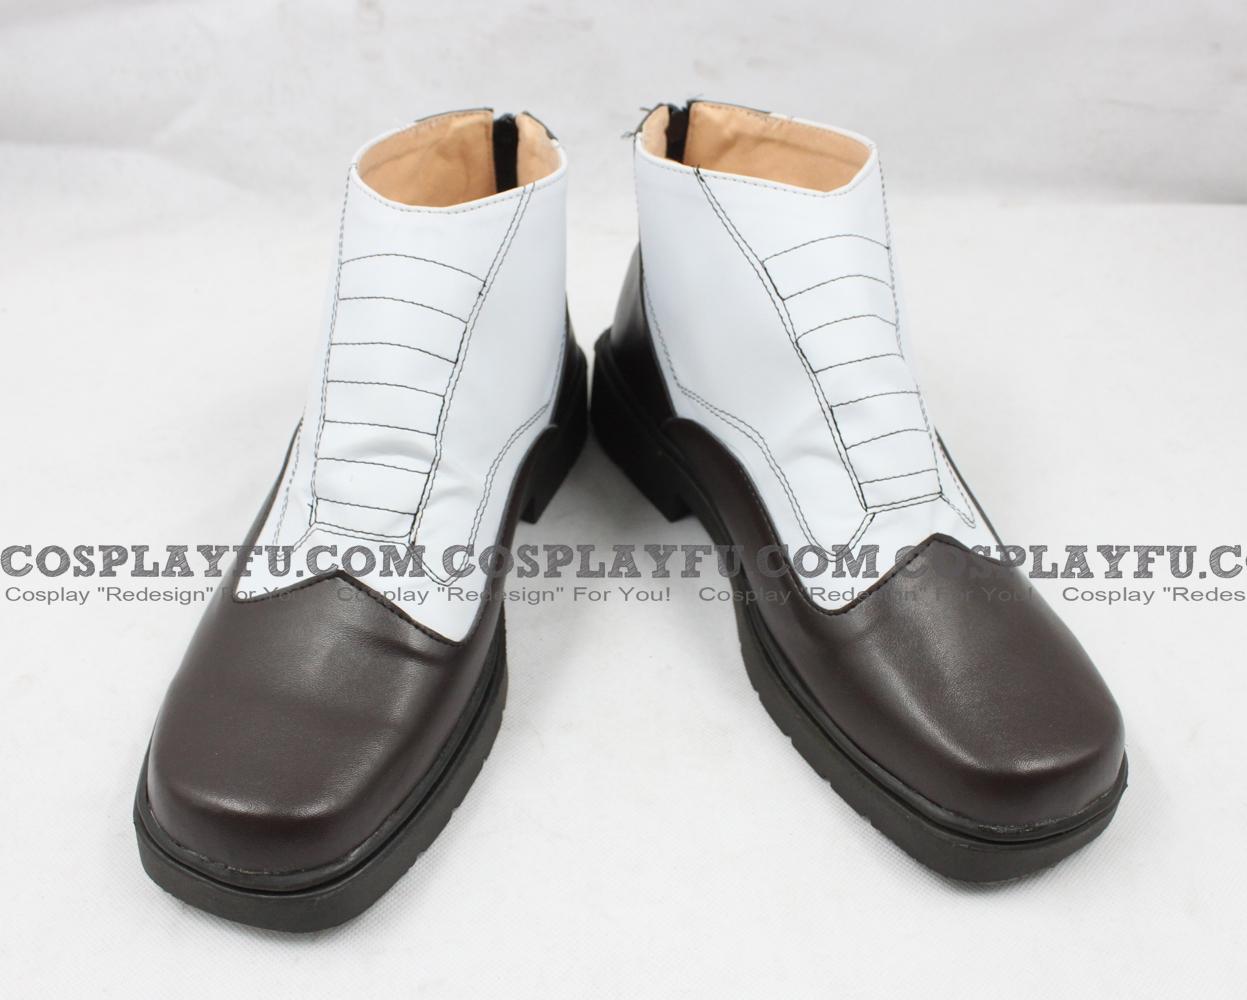 Kusanagi Shoes from K